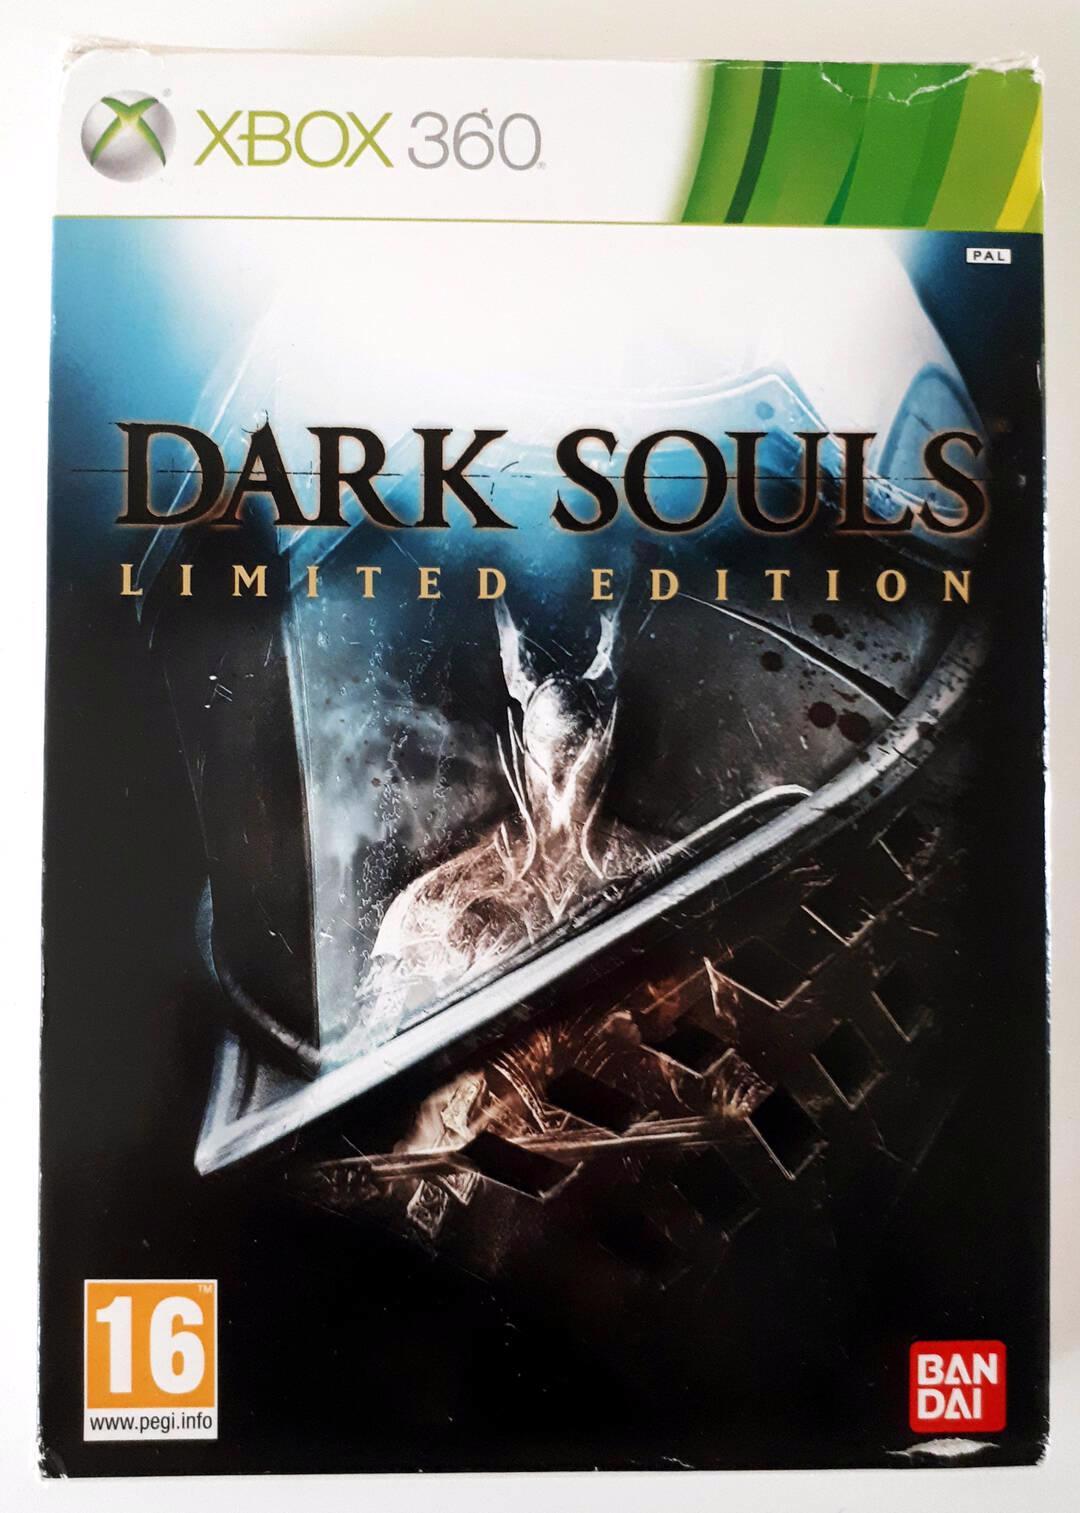 Dark Souls - Limited Edition na Xbox 360 - foto 1